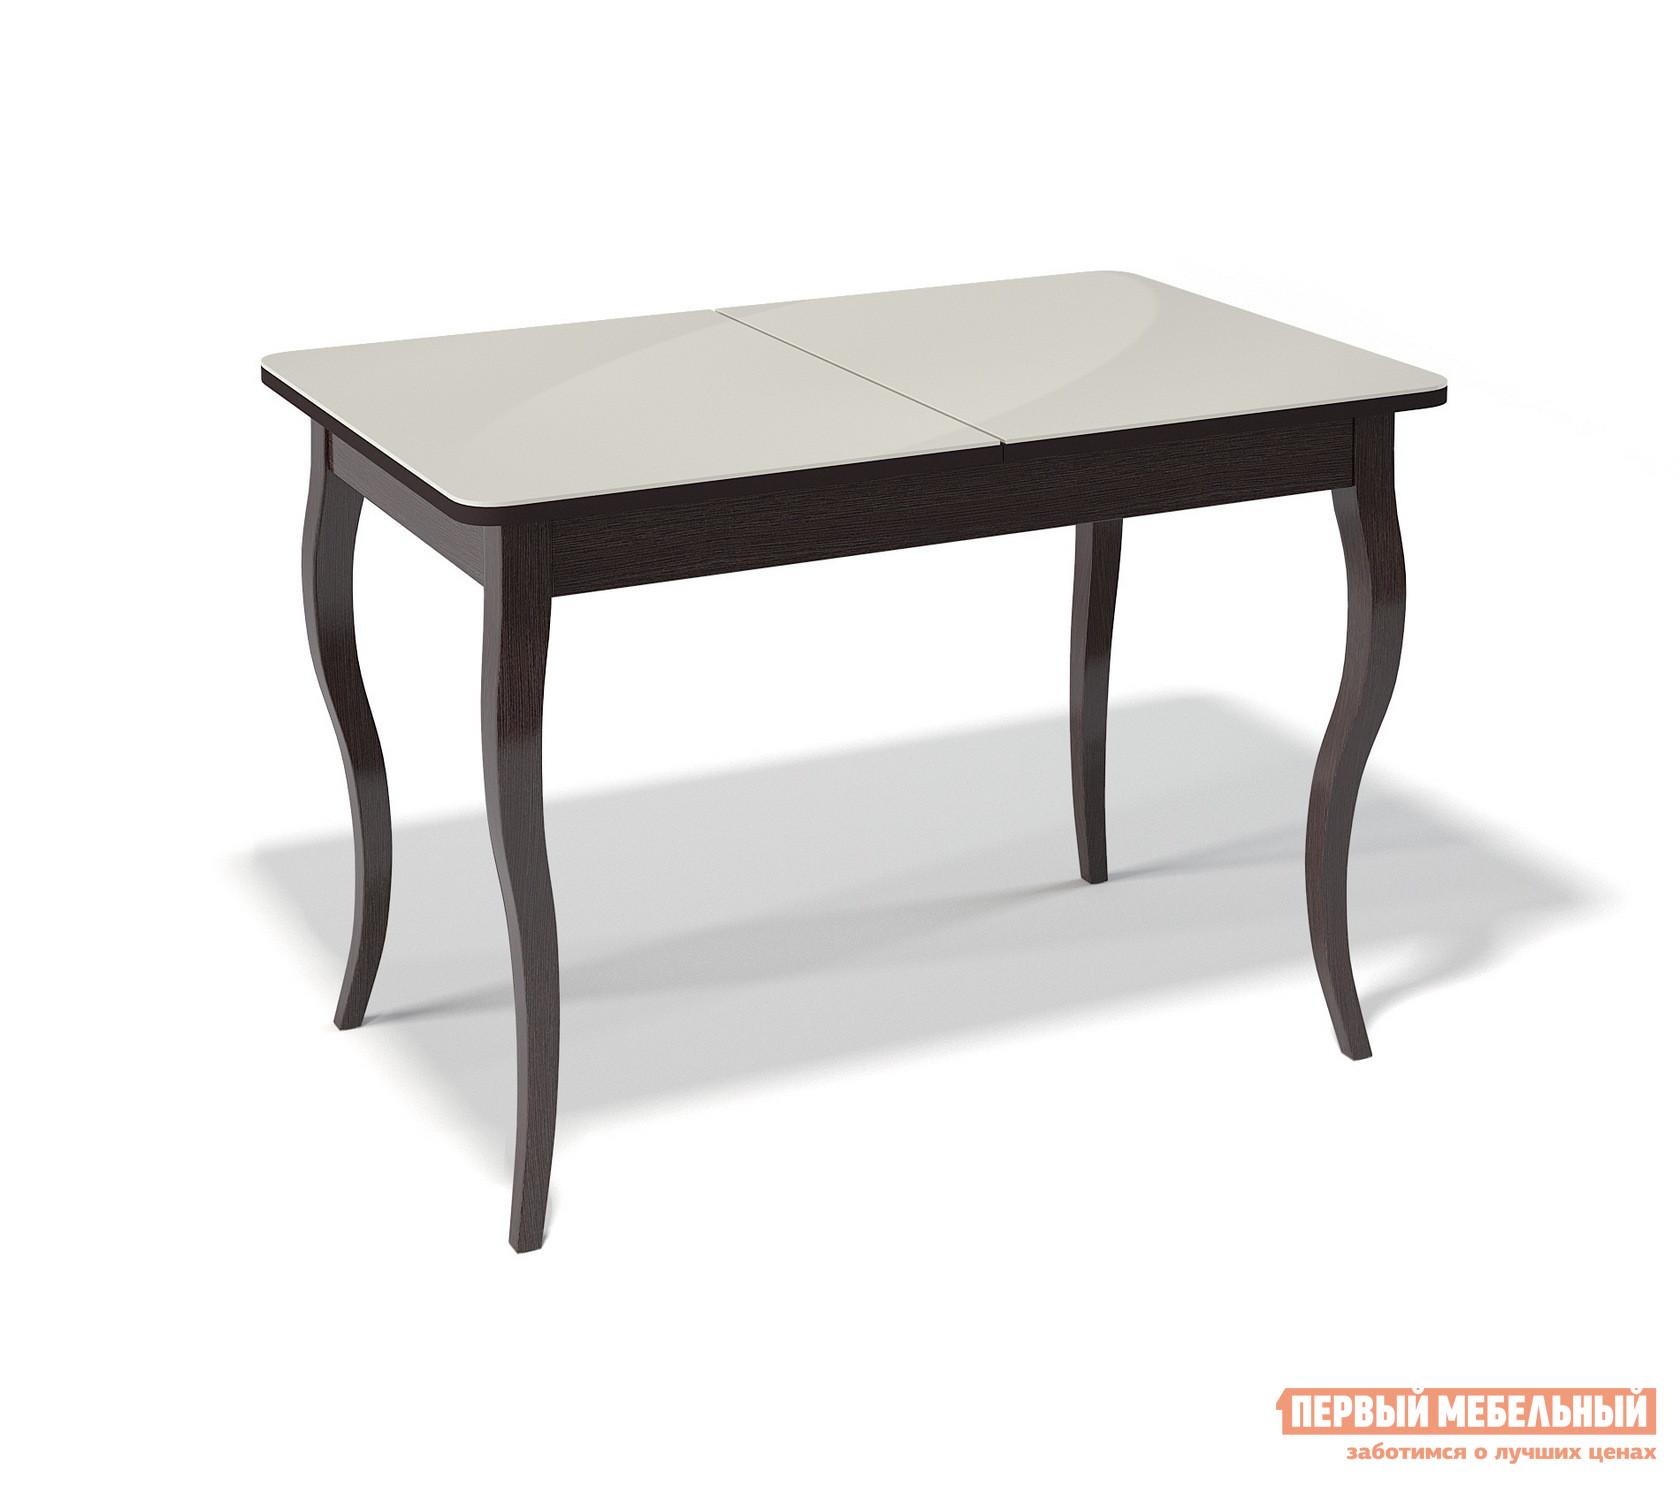 Кухонный стол ДИК KENNER 1100С круглый кухонный стол глянцевый дик kenner 1000с